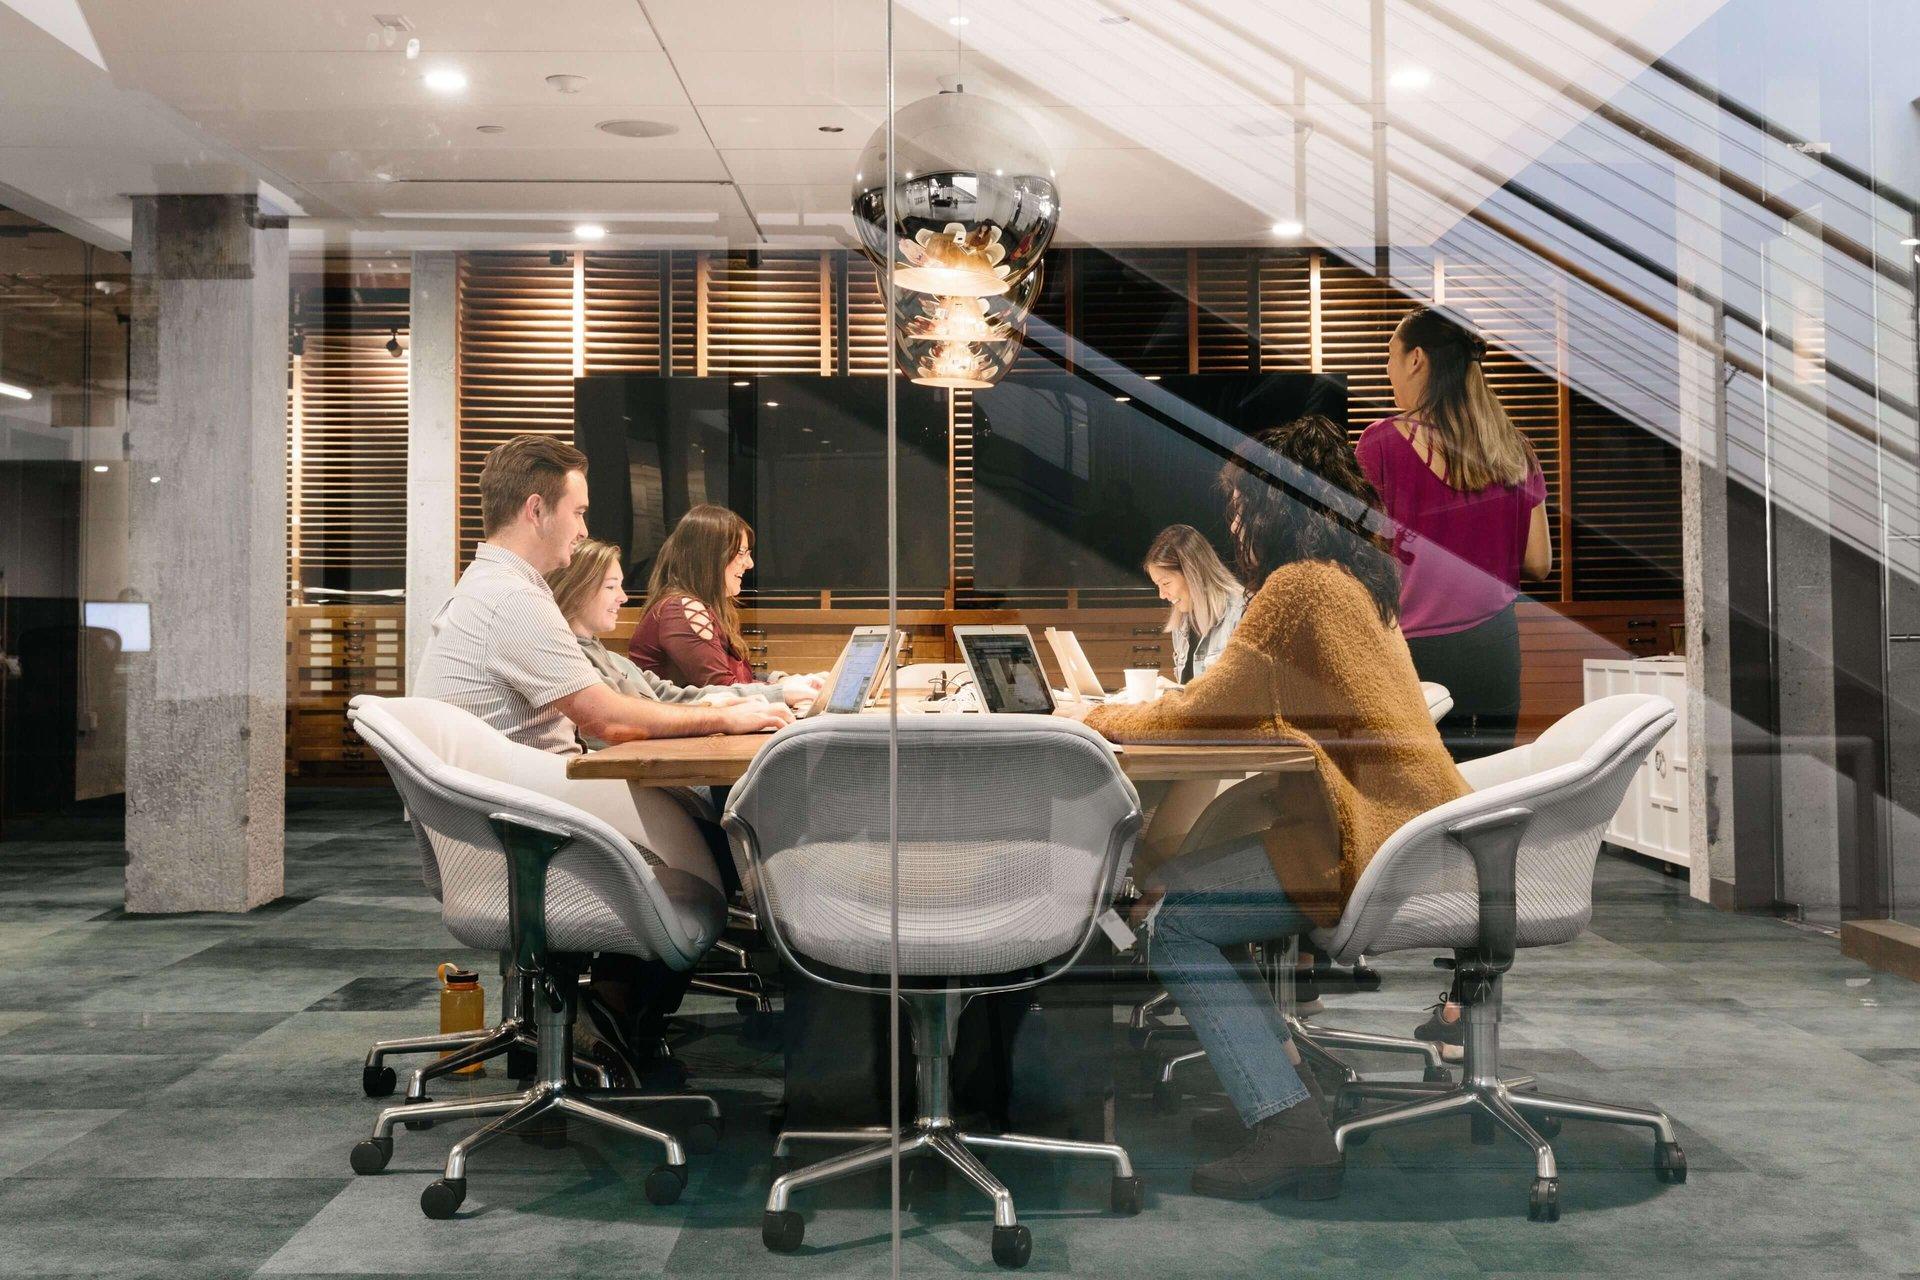 People sitting around a meeting room